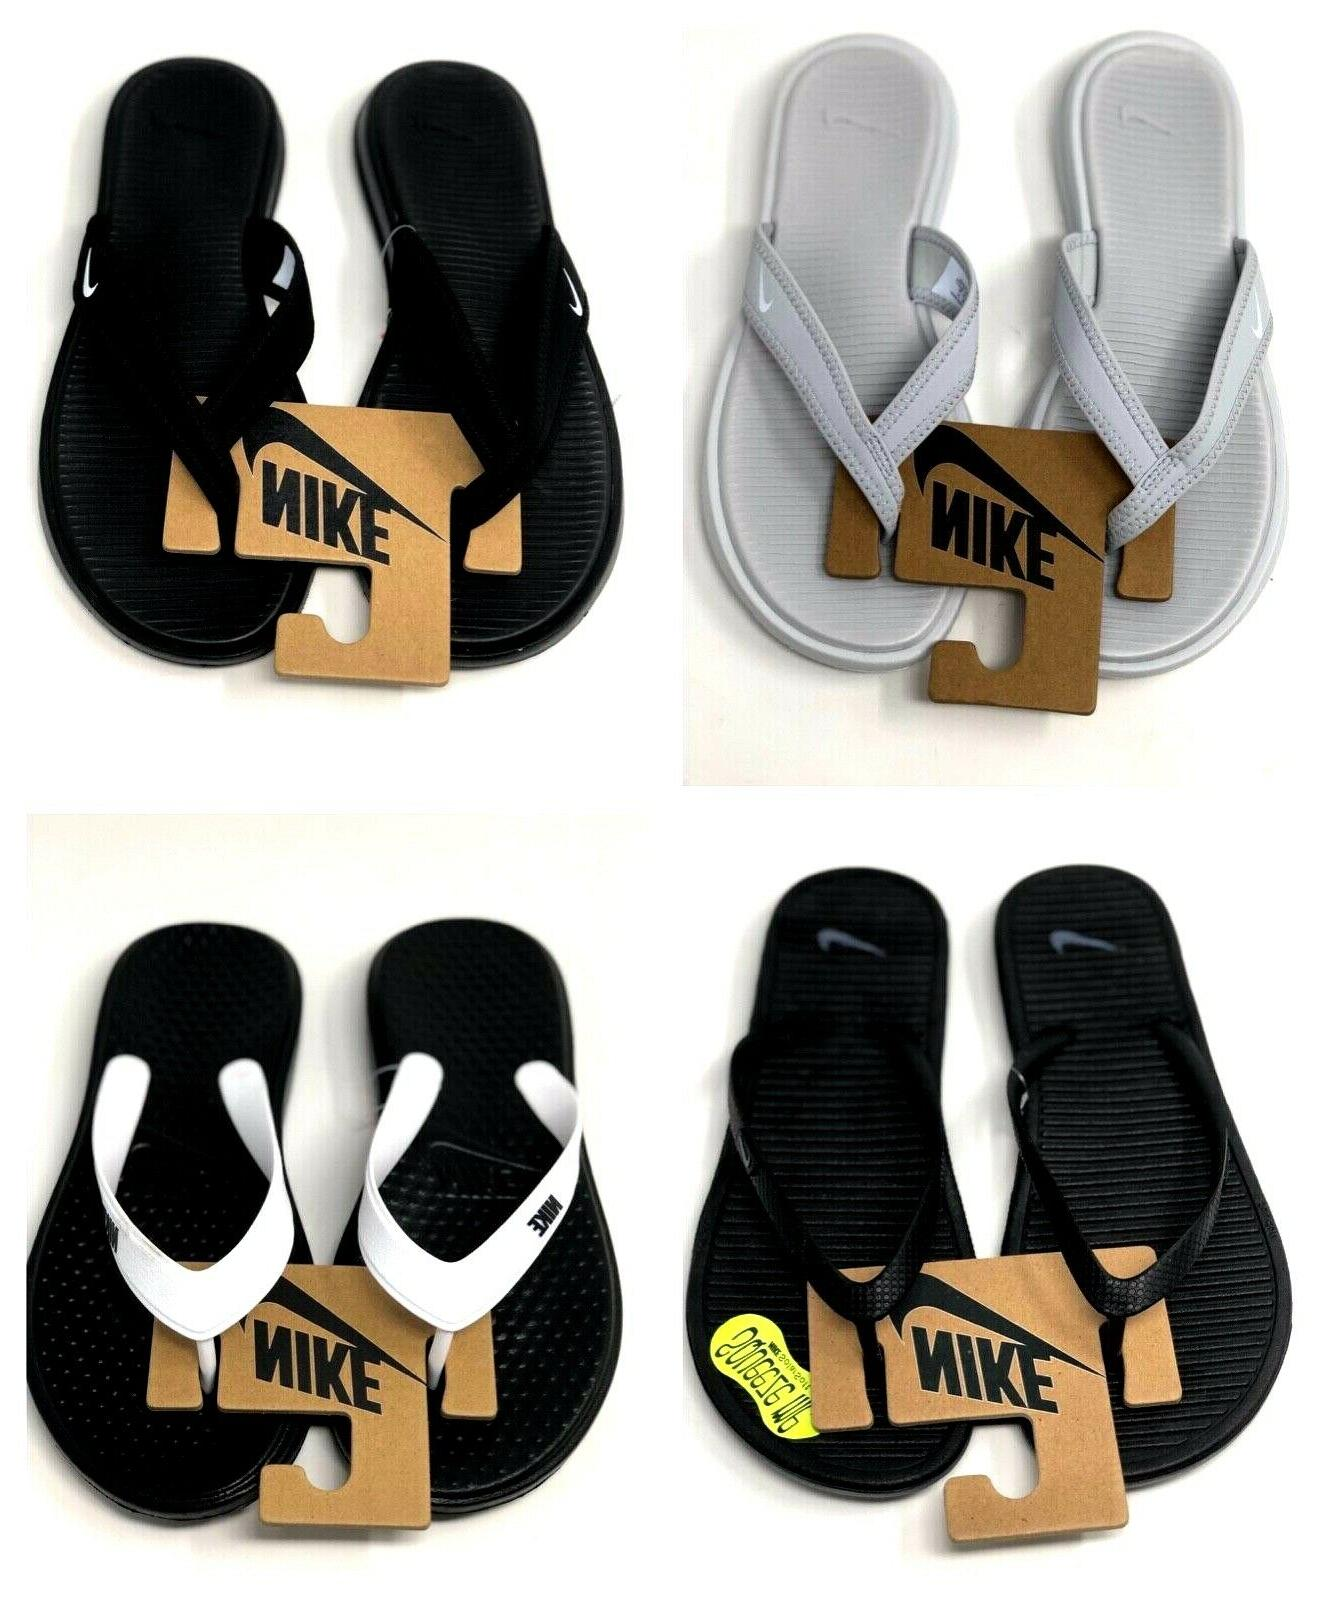 Nike Thong Sport Sandals Flip Flops Celso Comfort Solay Solarsoft 2